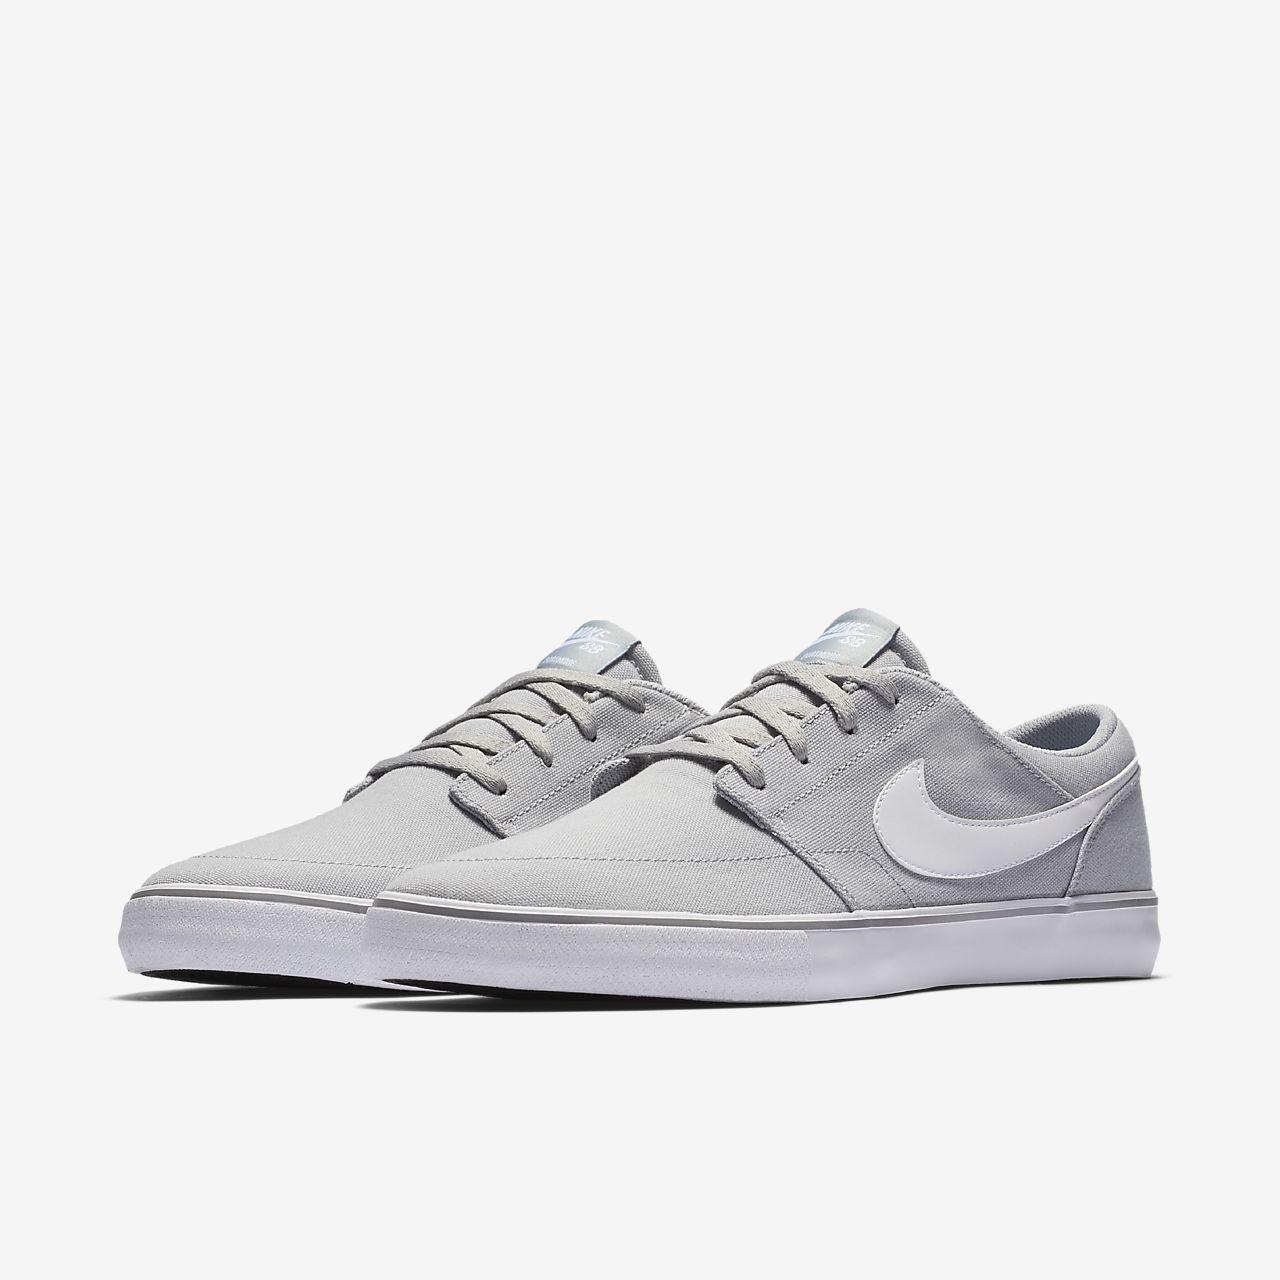 Nike SB Portmore II Mens Skateboarding Shoes Athletic Sneakers Canvas Blue White